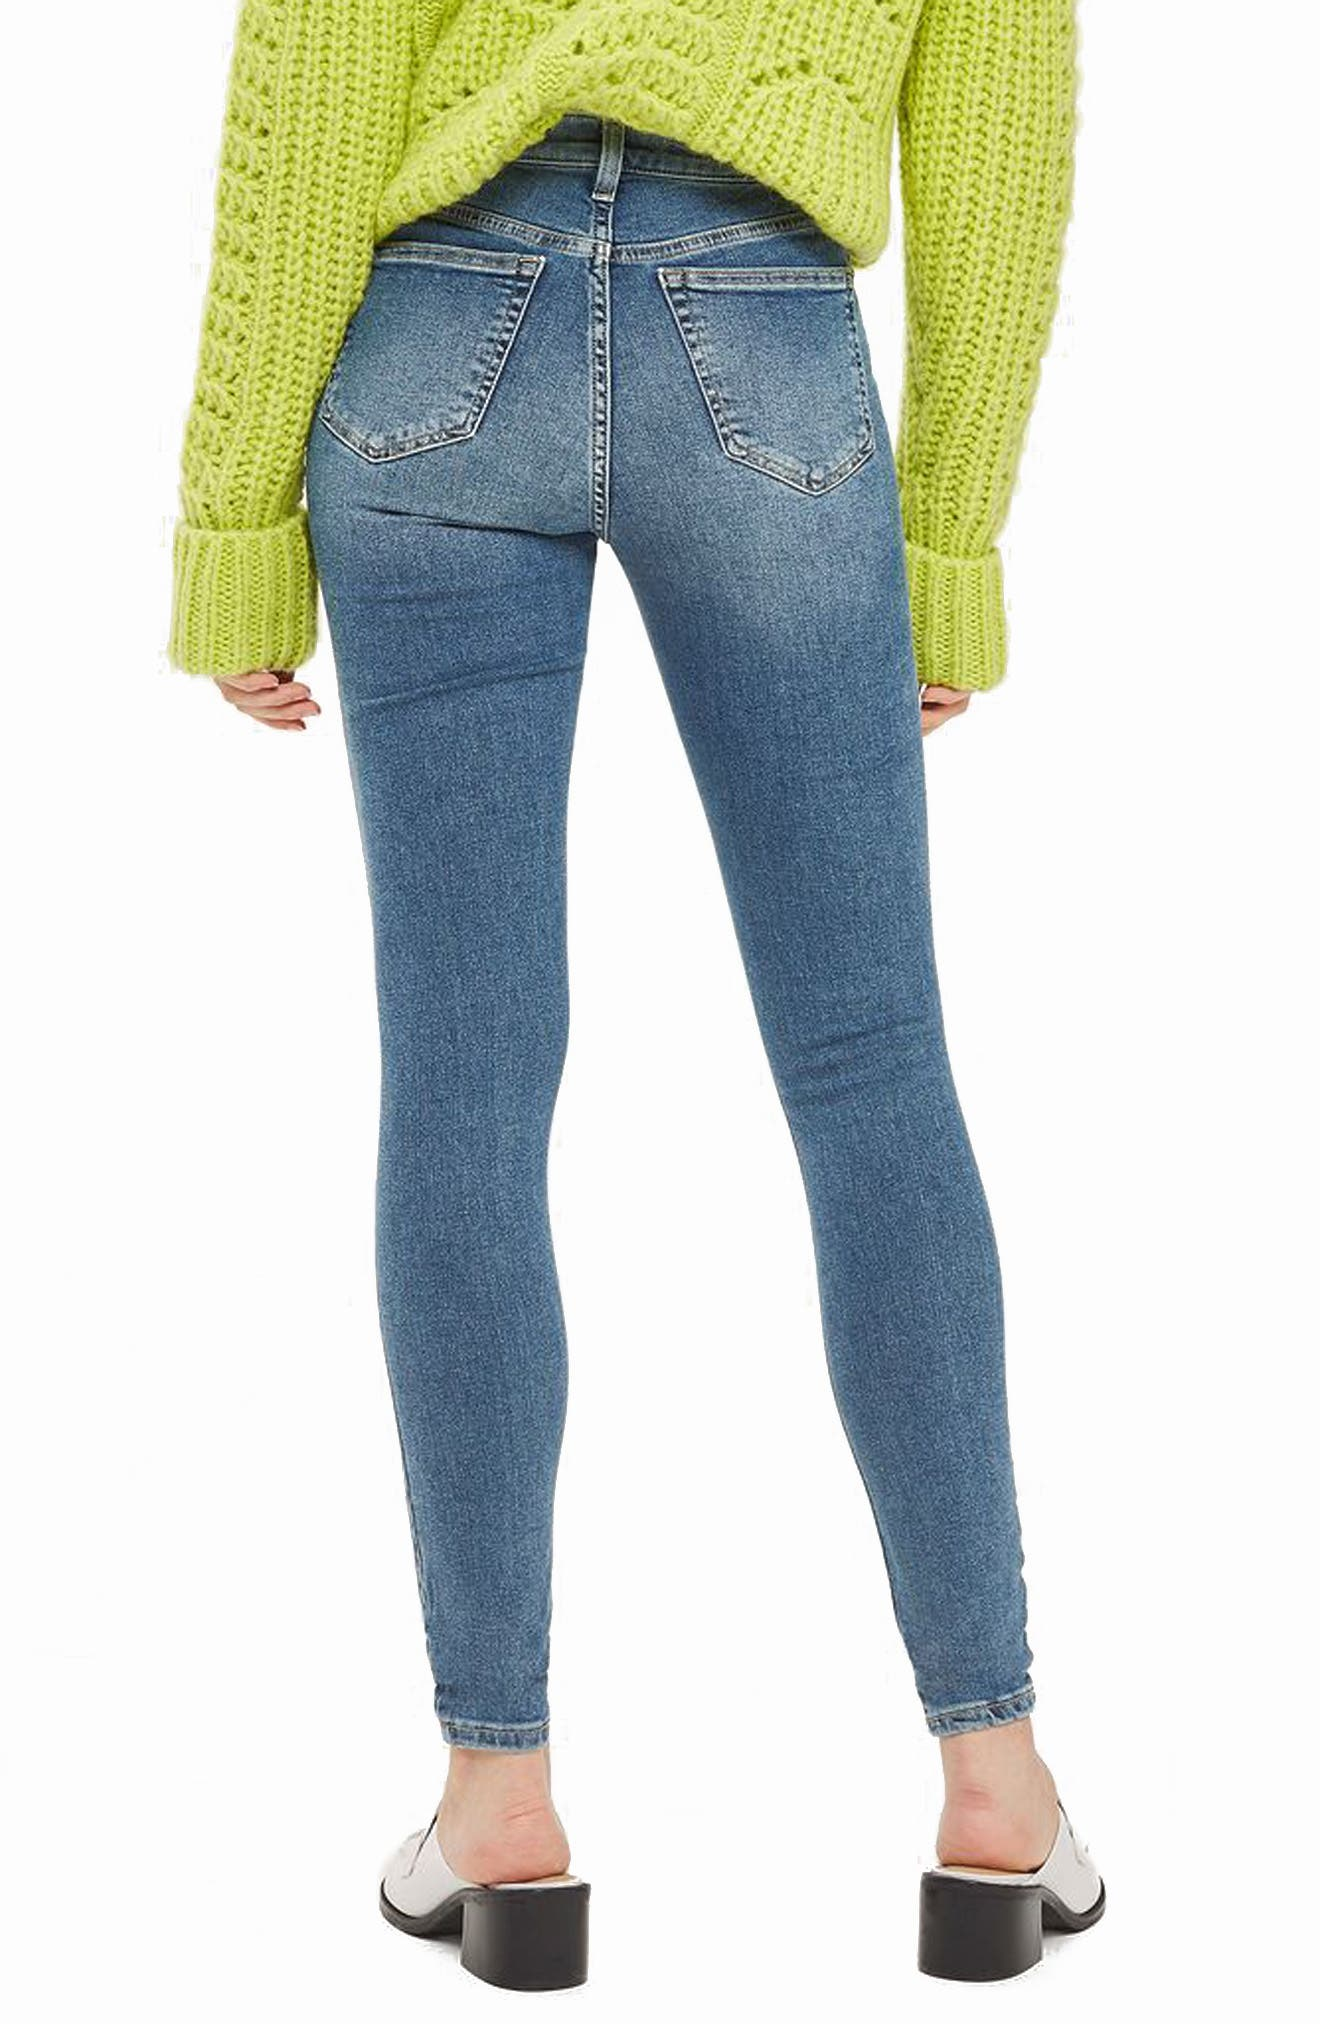 Jamie Rip High Waist Skinny Jeans,                             Alternate thumbnail 2, color,                             400